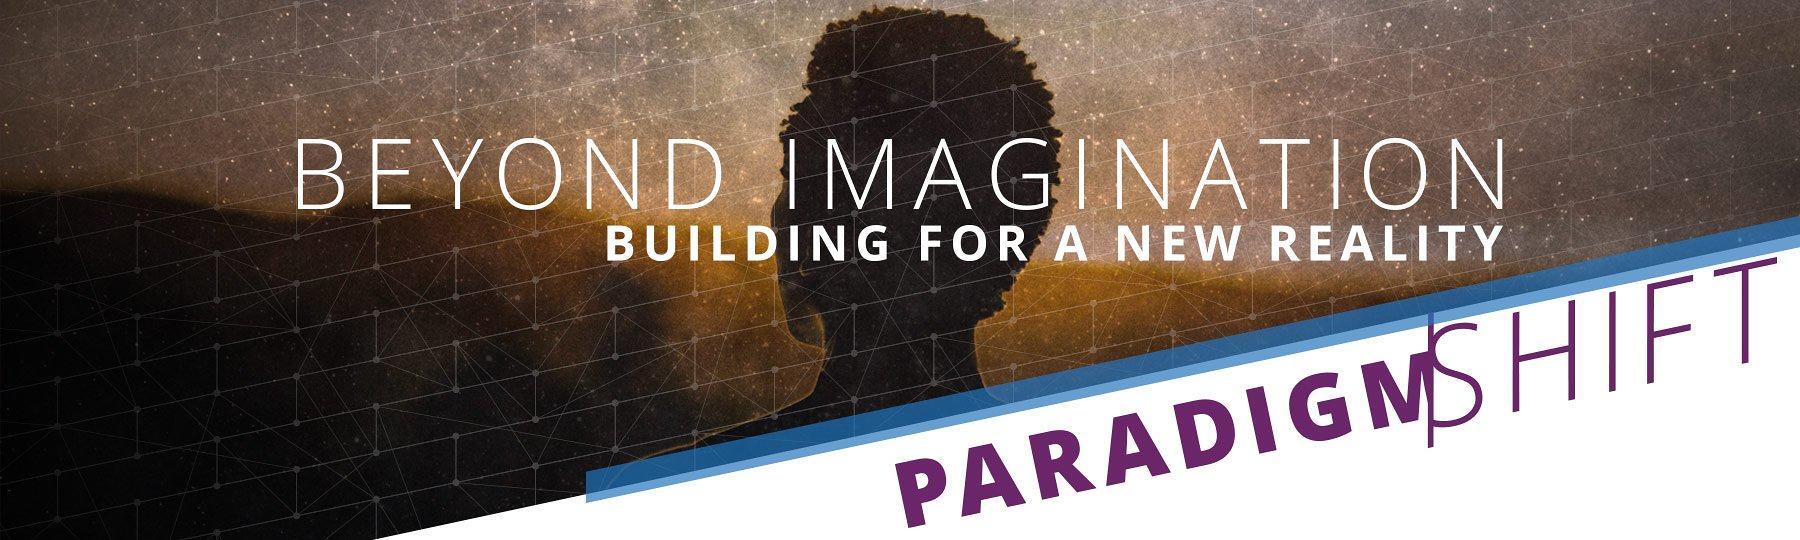 ParadigmShift 2017